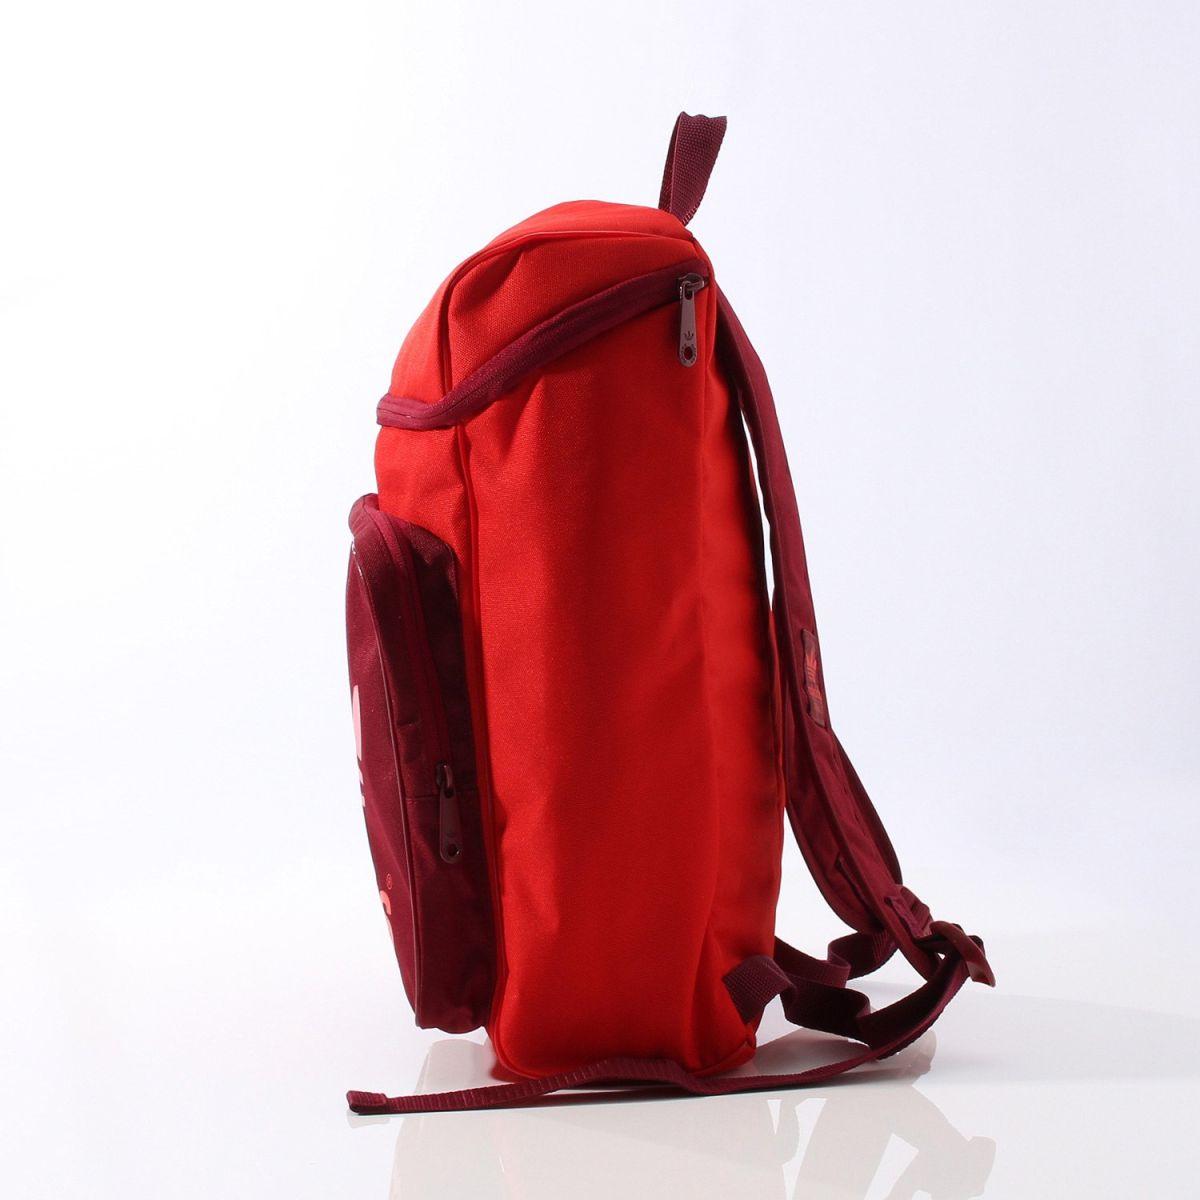 adidas 아디다스오리지나르스박크팍크[BP CLASSIC]레이디스 맨즈 Originals 가방 S20073